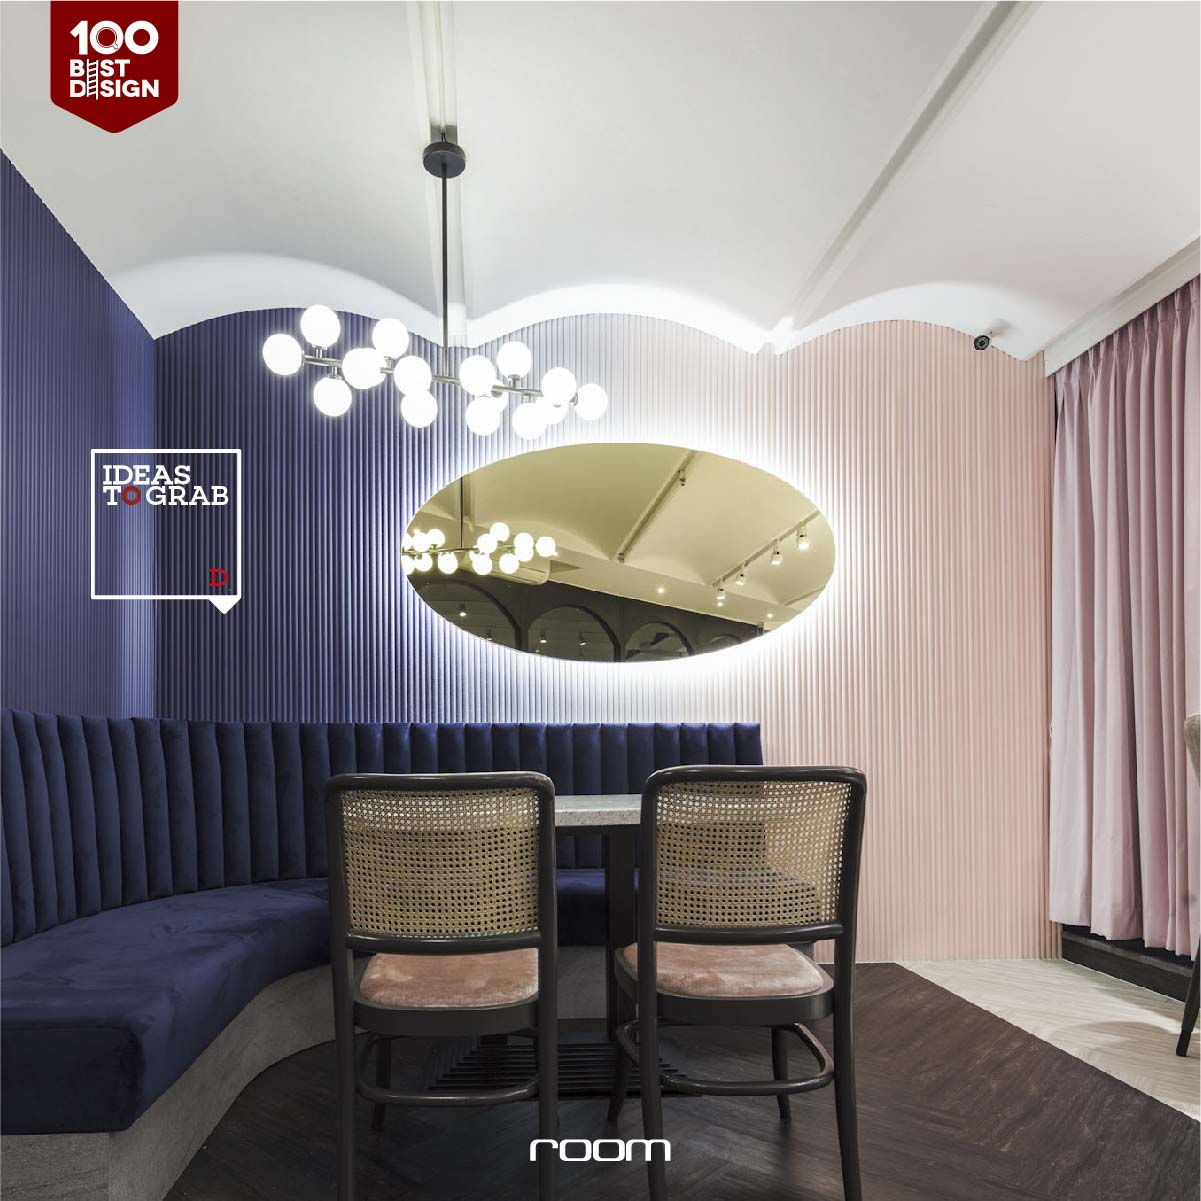 Pastel Color Cafe Decoration Idea - Wordenring